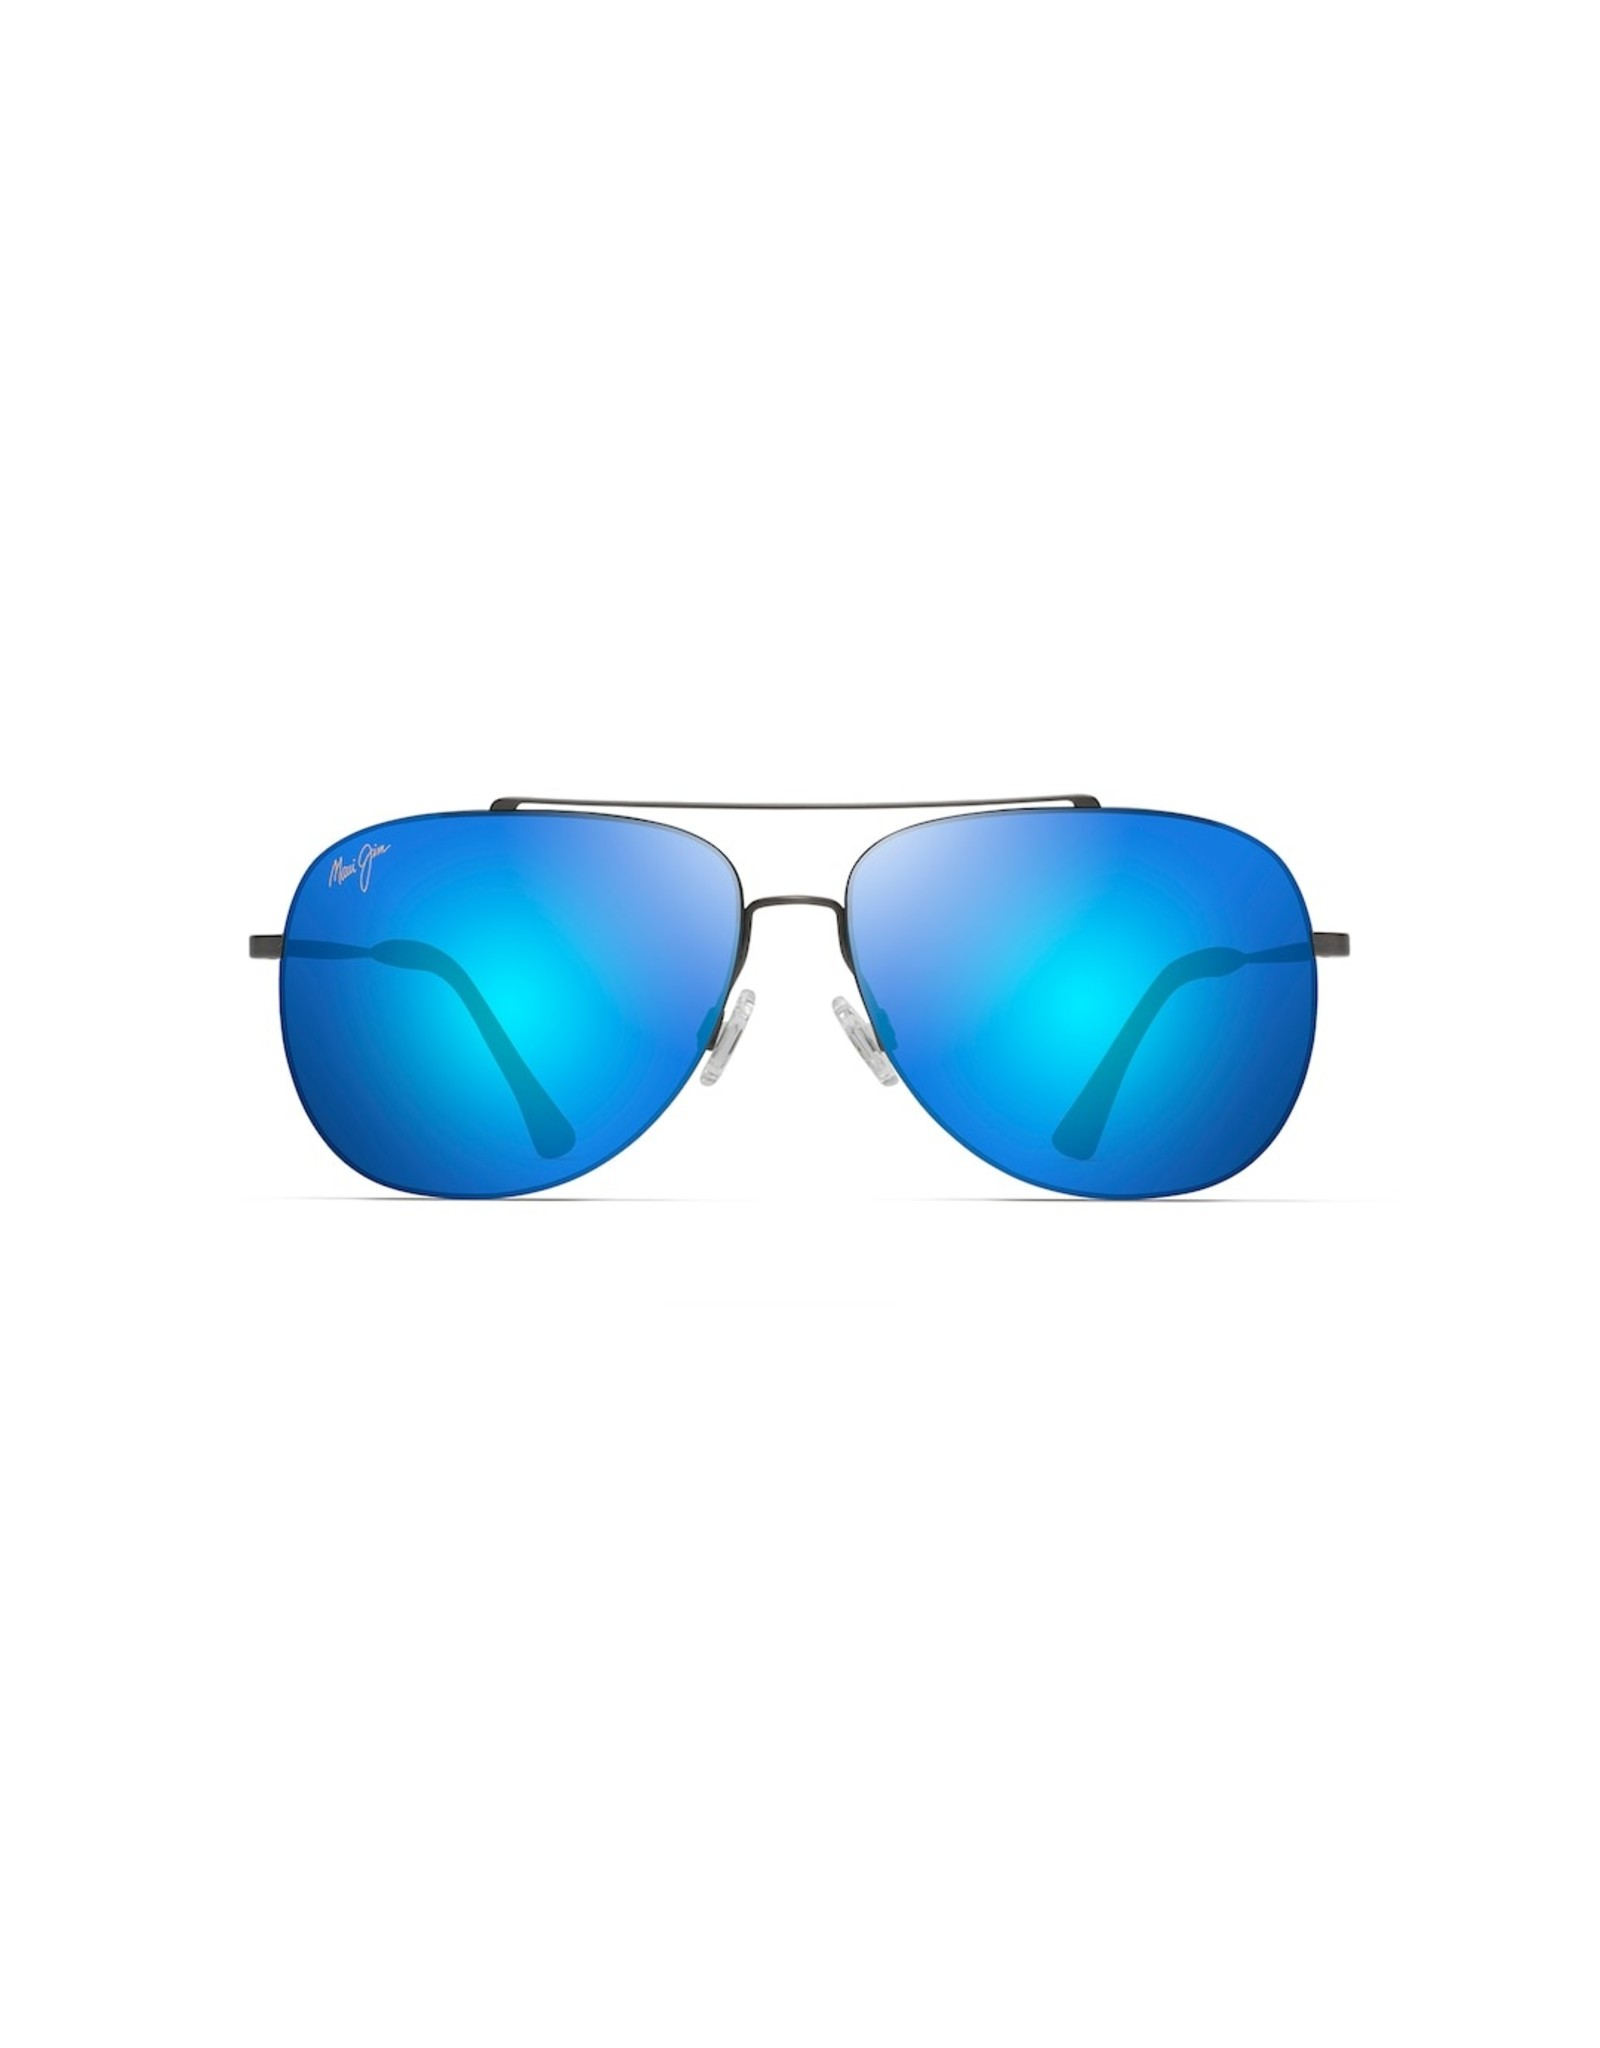 Maui Jim Maui Jim 'Cinder Cone' Sunglasses